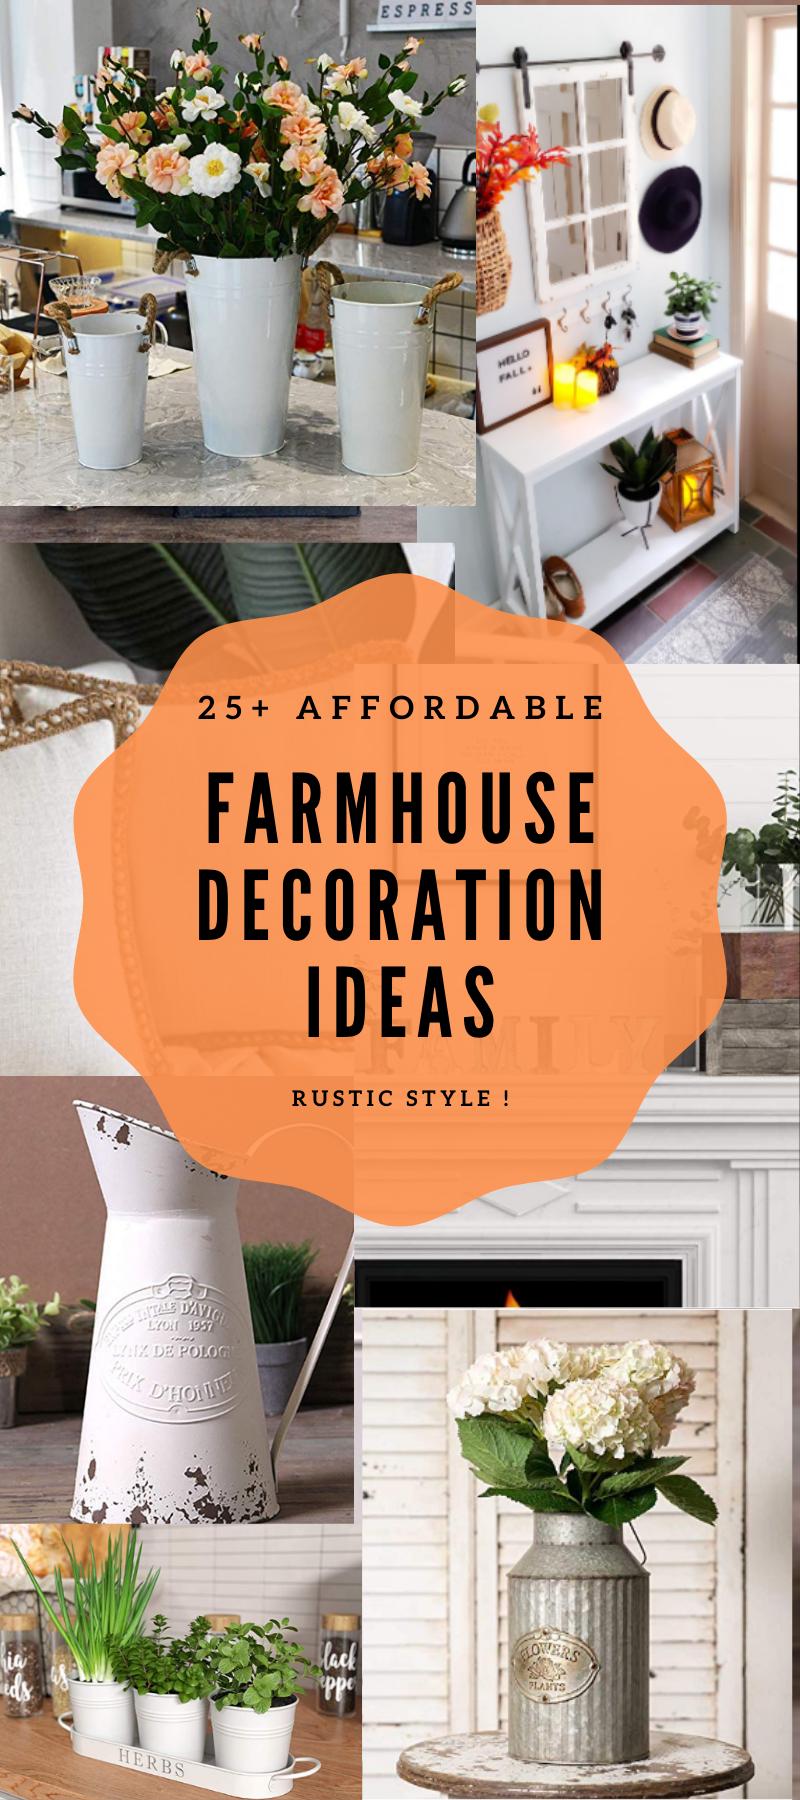 25+ Affordable Farmhouse Decoration Ideas, 2020 Home Decor , Rustic Home Decoration, Living Room Design Ideas #homedecorinspiration #rustichome #farmhouse